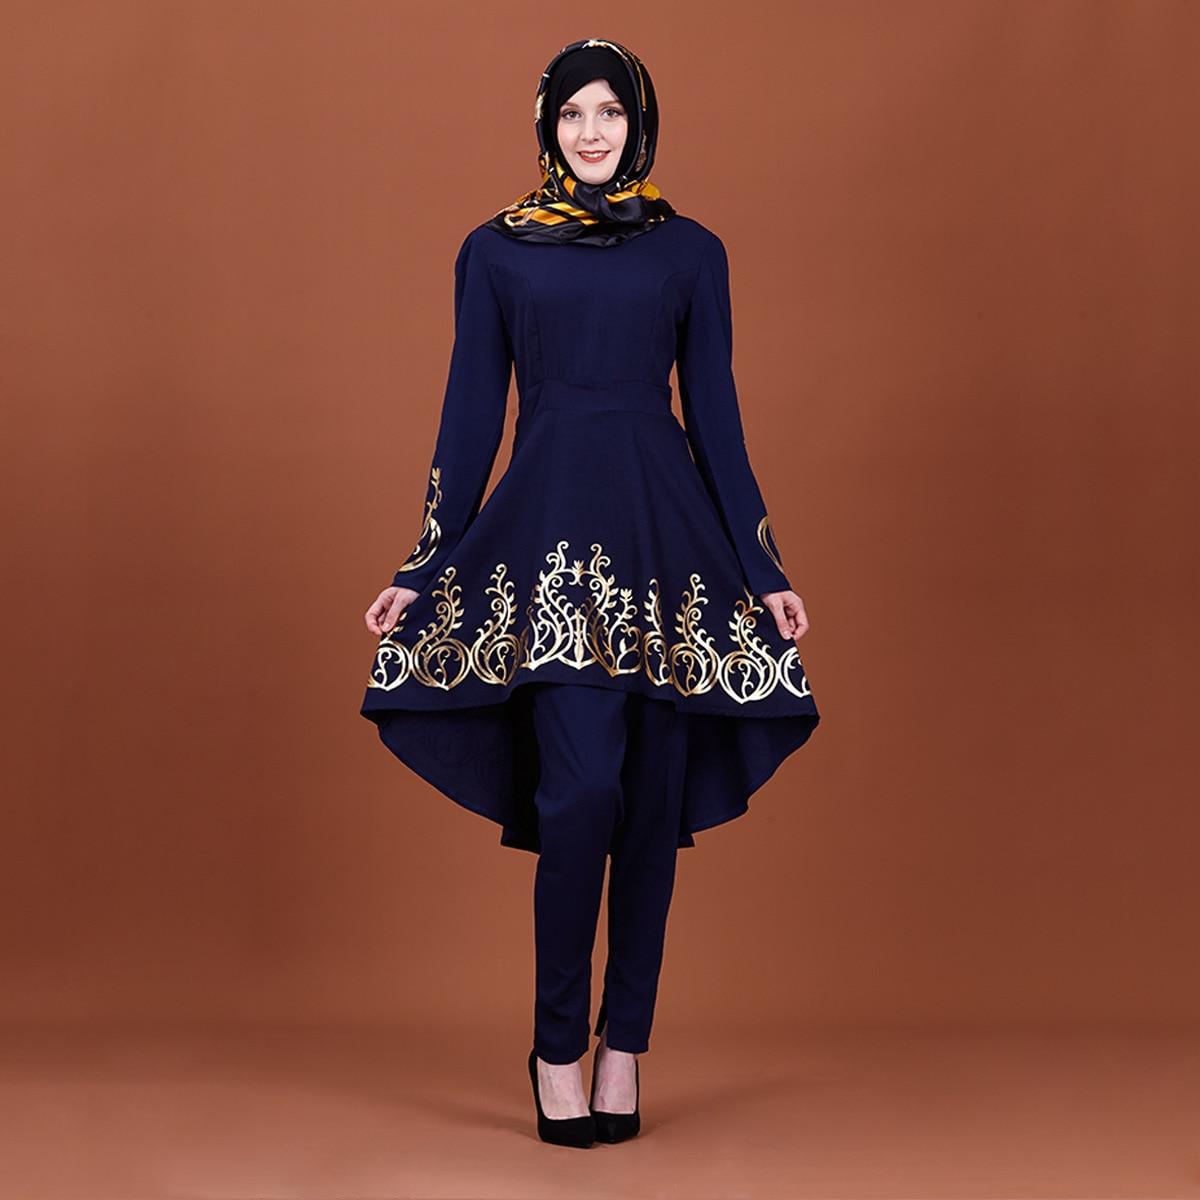 Muslim Dress Women Islamic Clothing Moroccan Kaftan Hot Stamping Fashion Abayas Robe Dubai Abaya Turkish Clothes New Women Women's Abaya Women's Clothings cb5feb1b7314637725a2e7: Dark Brown|black|Navy blue